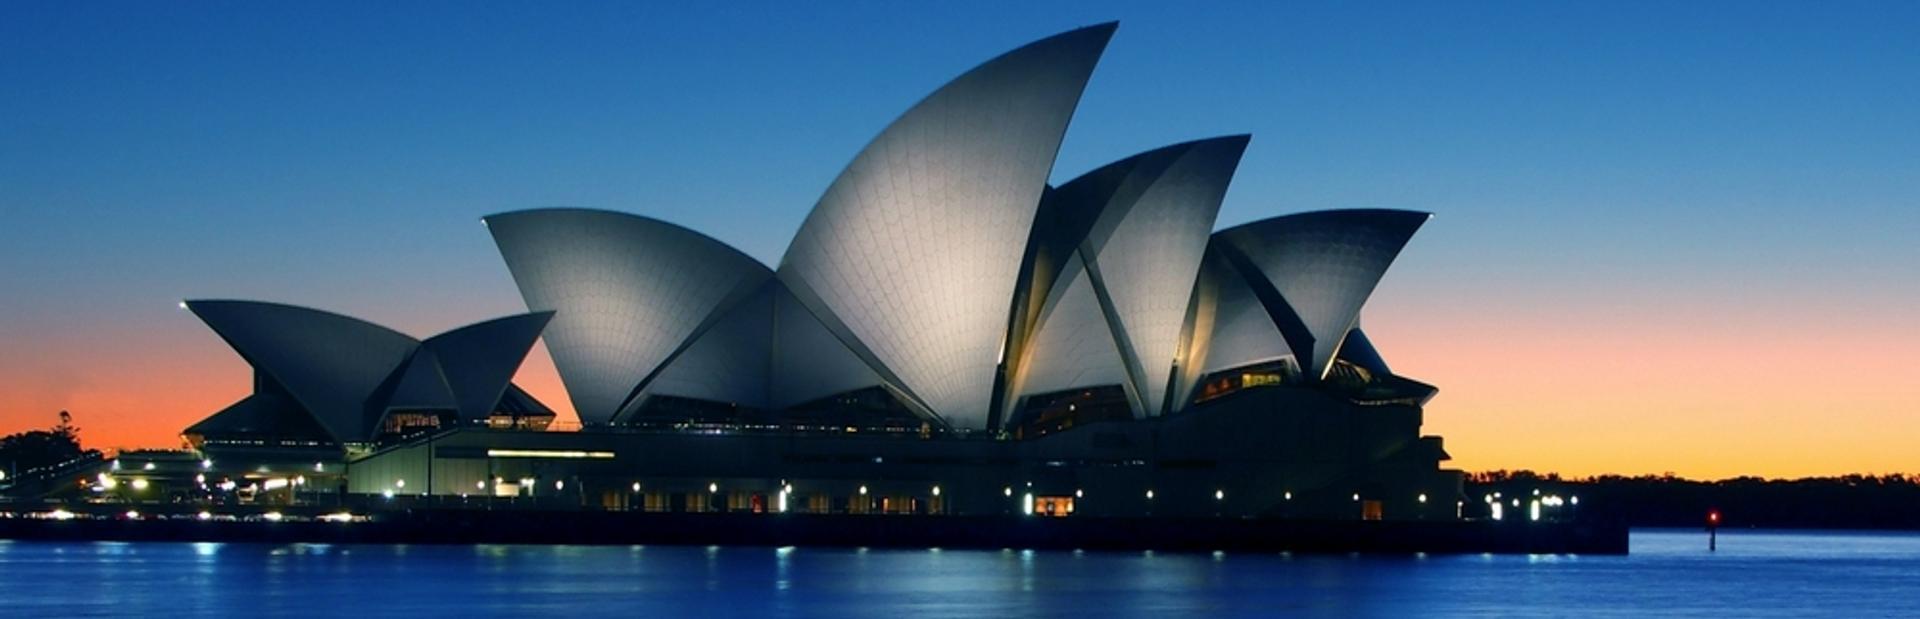 The Sydney Opera House at night